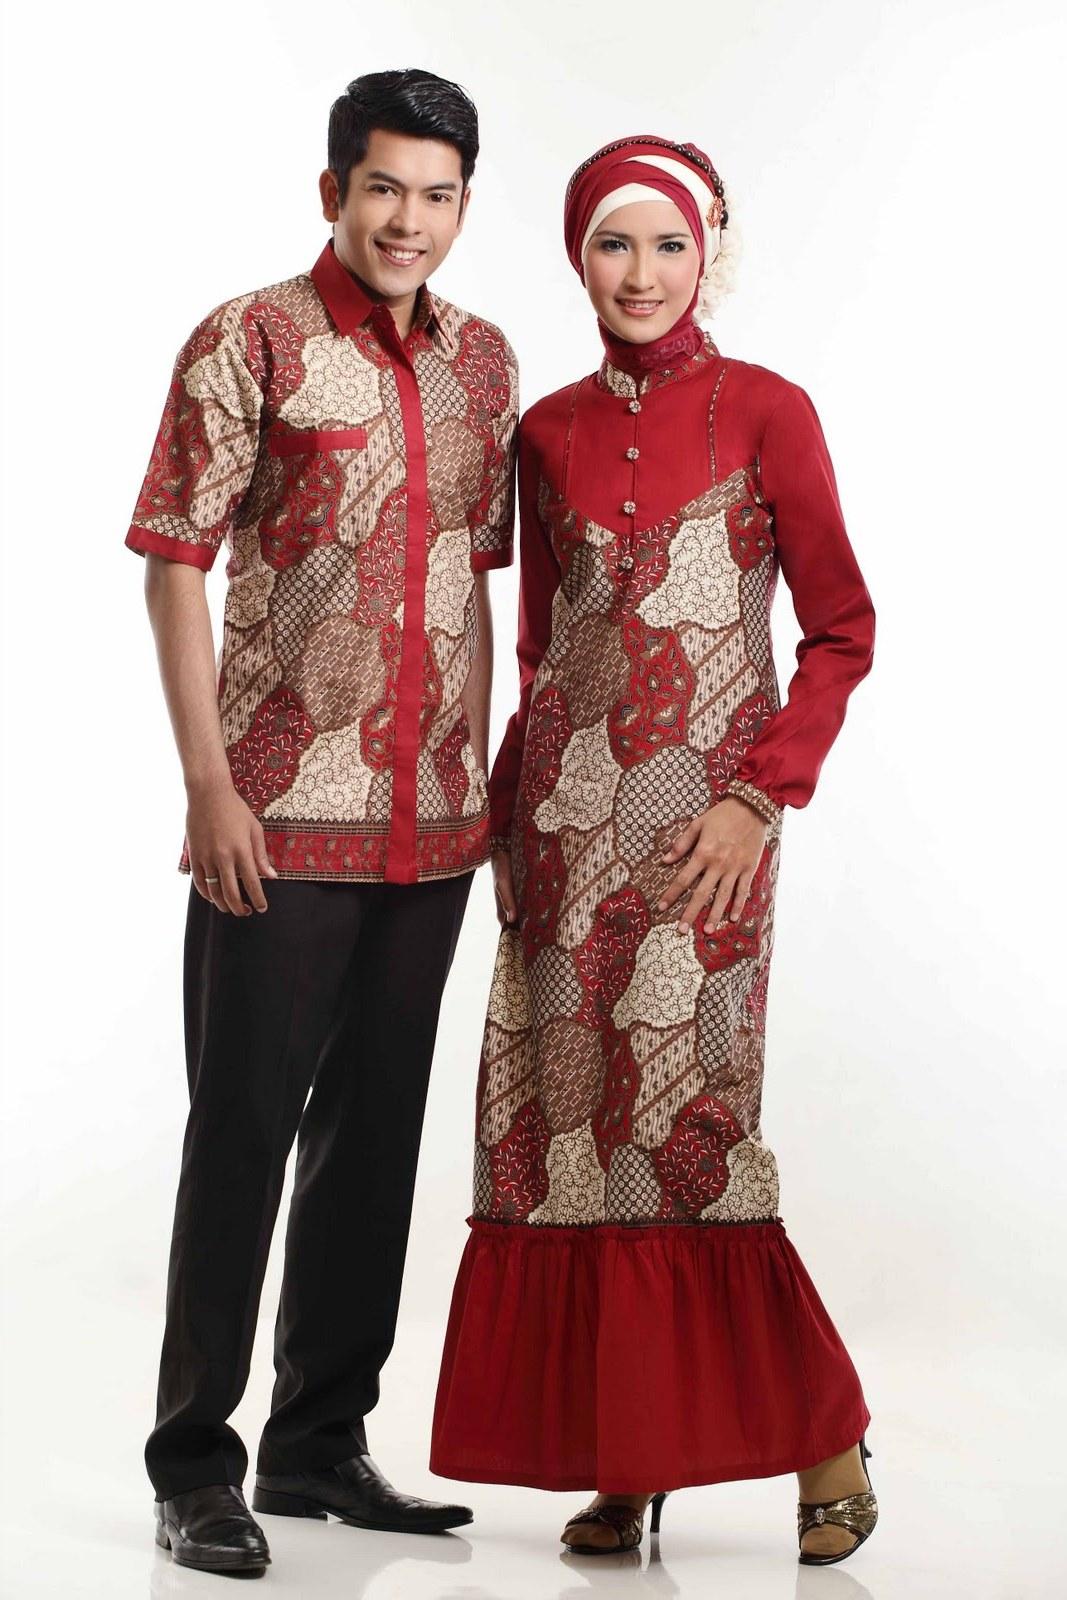 Model Gambar Model Baju Lebaran Budm Bintang anda Trend Model Baju Batik Lebaran Terbaru 2013